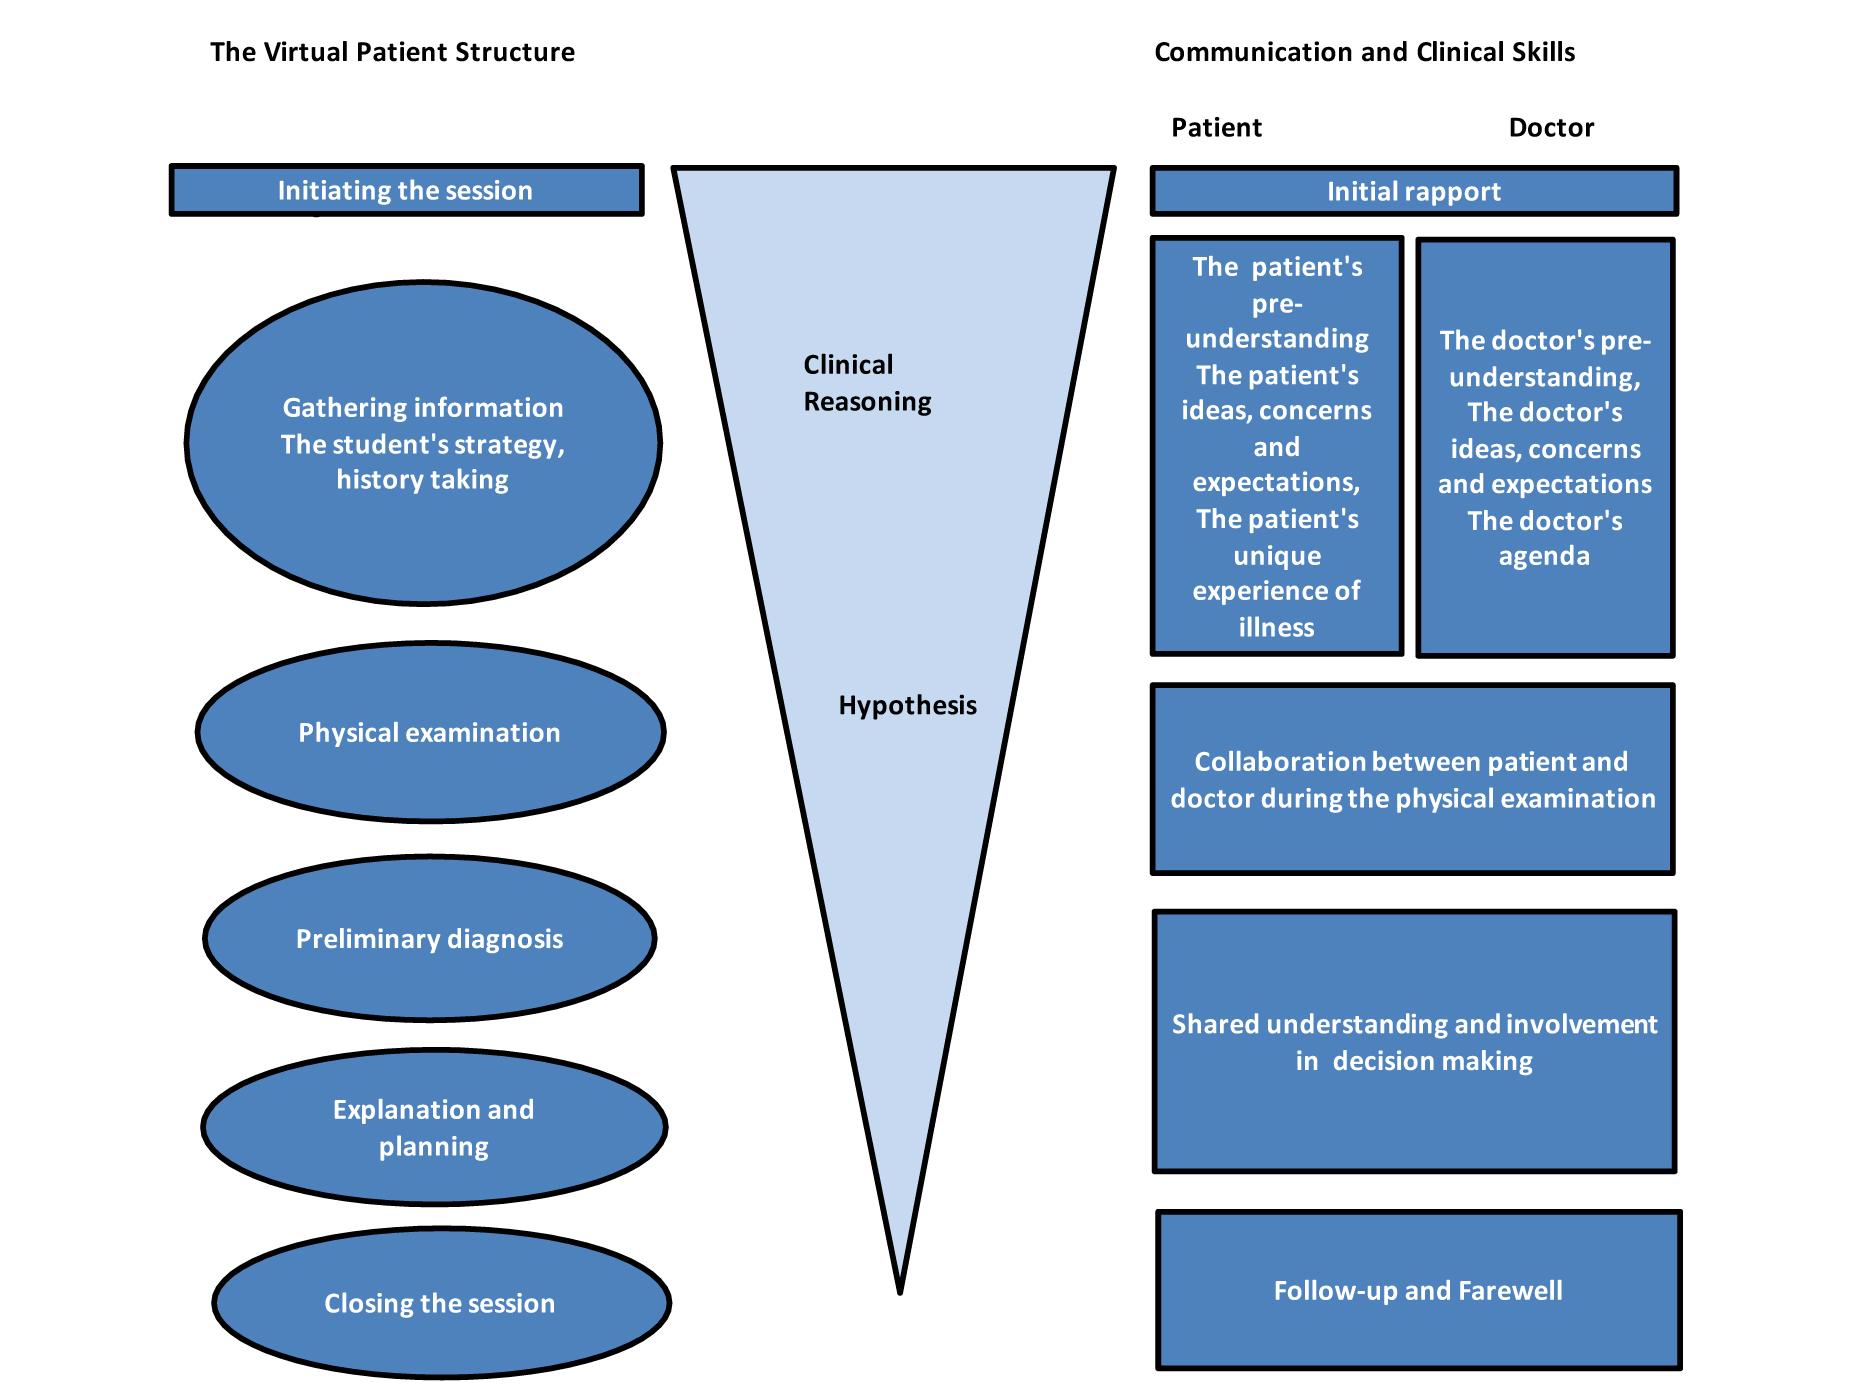 reflective essay on communication skills in nursing